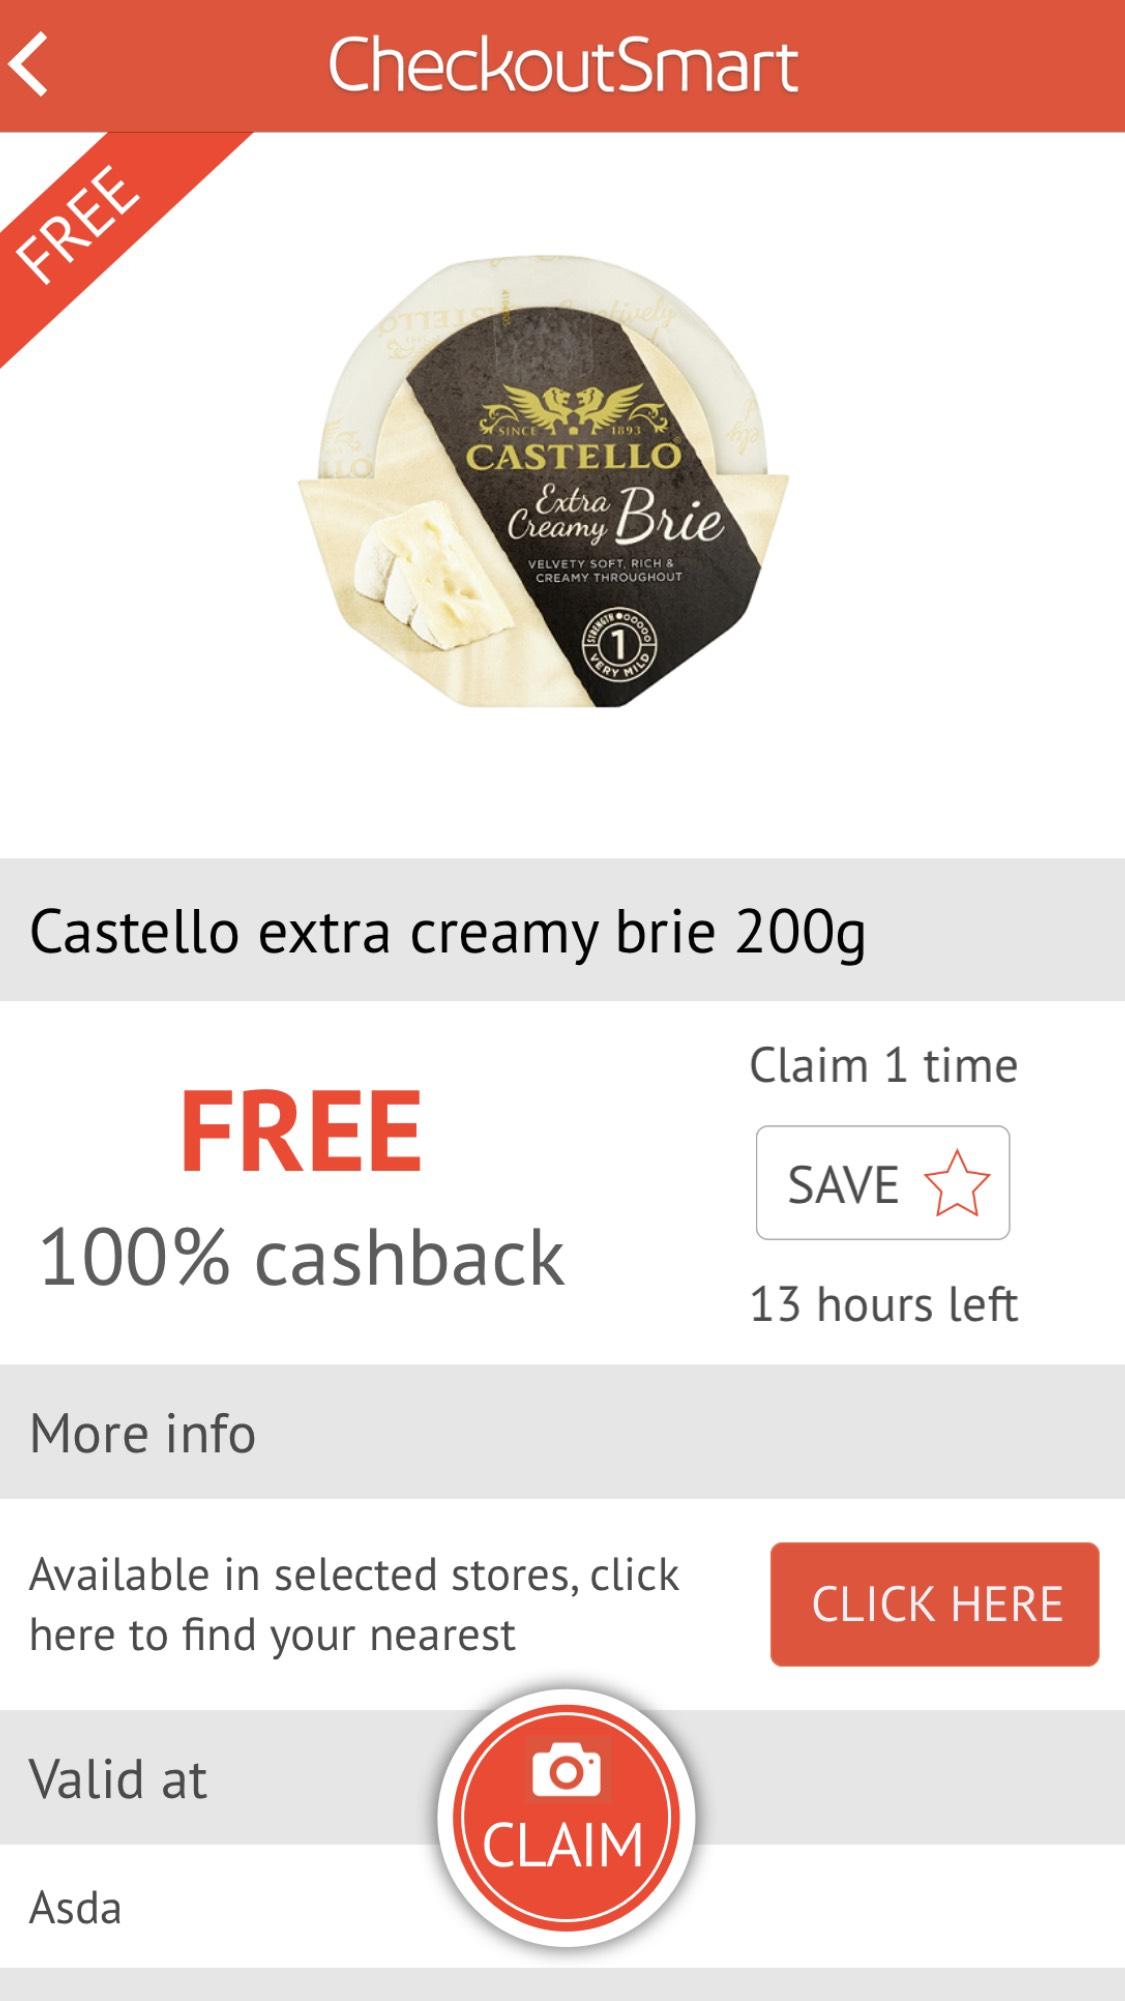 checkoutsmart free castello extra creamy brie 200g £1.50 @ Asda